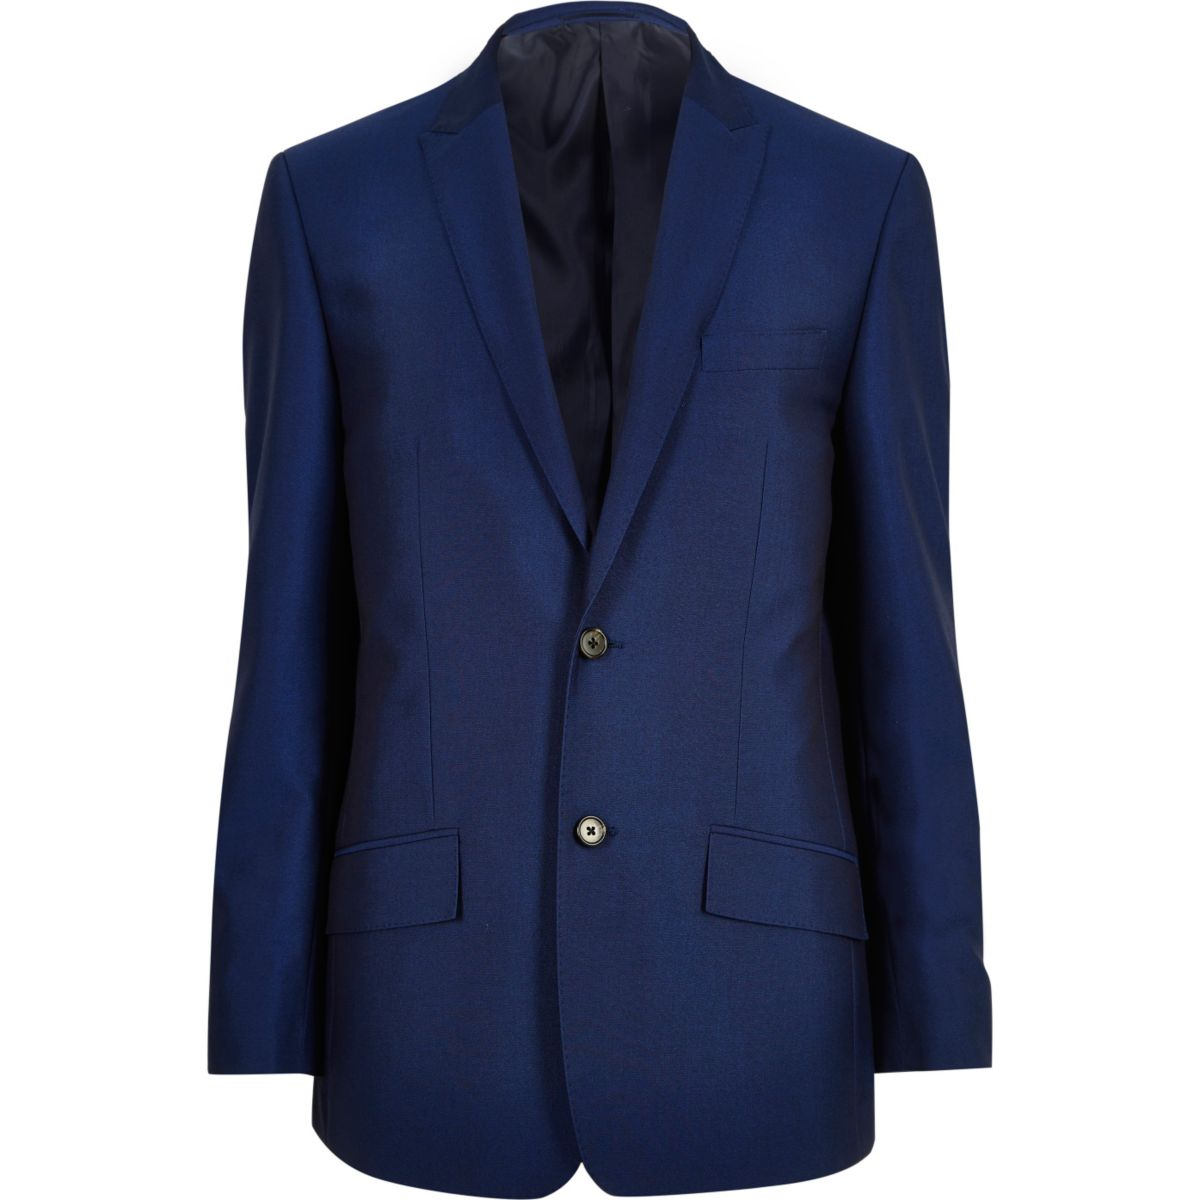 Blaue, elegante Anzugjacke